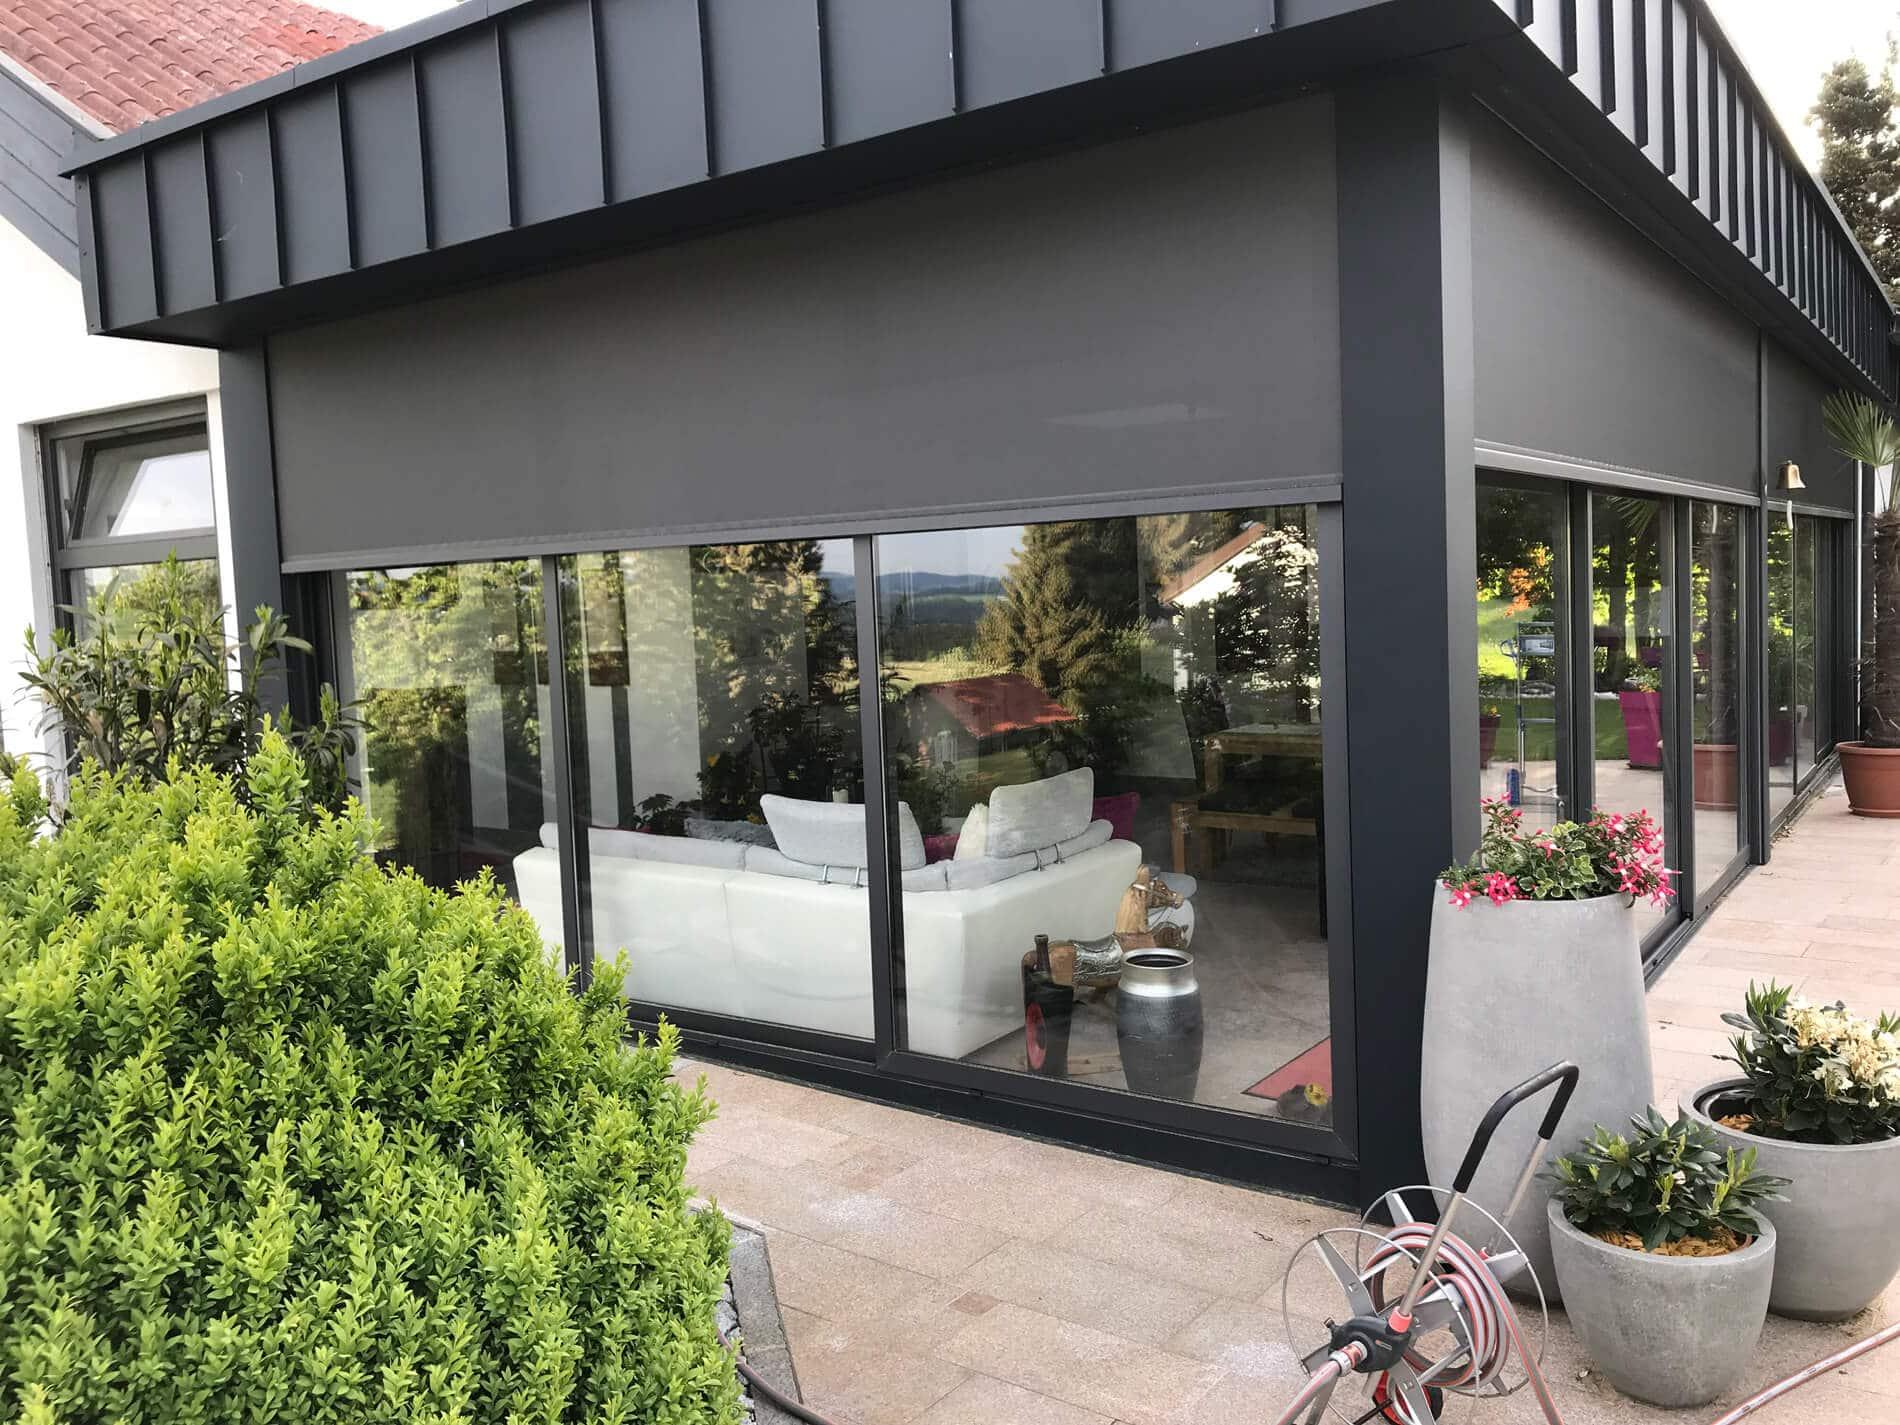 Wintergarten Anbau Ideen & Gestaltung